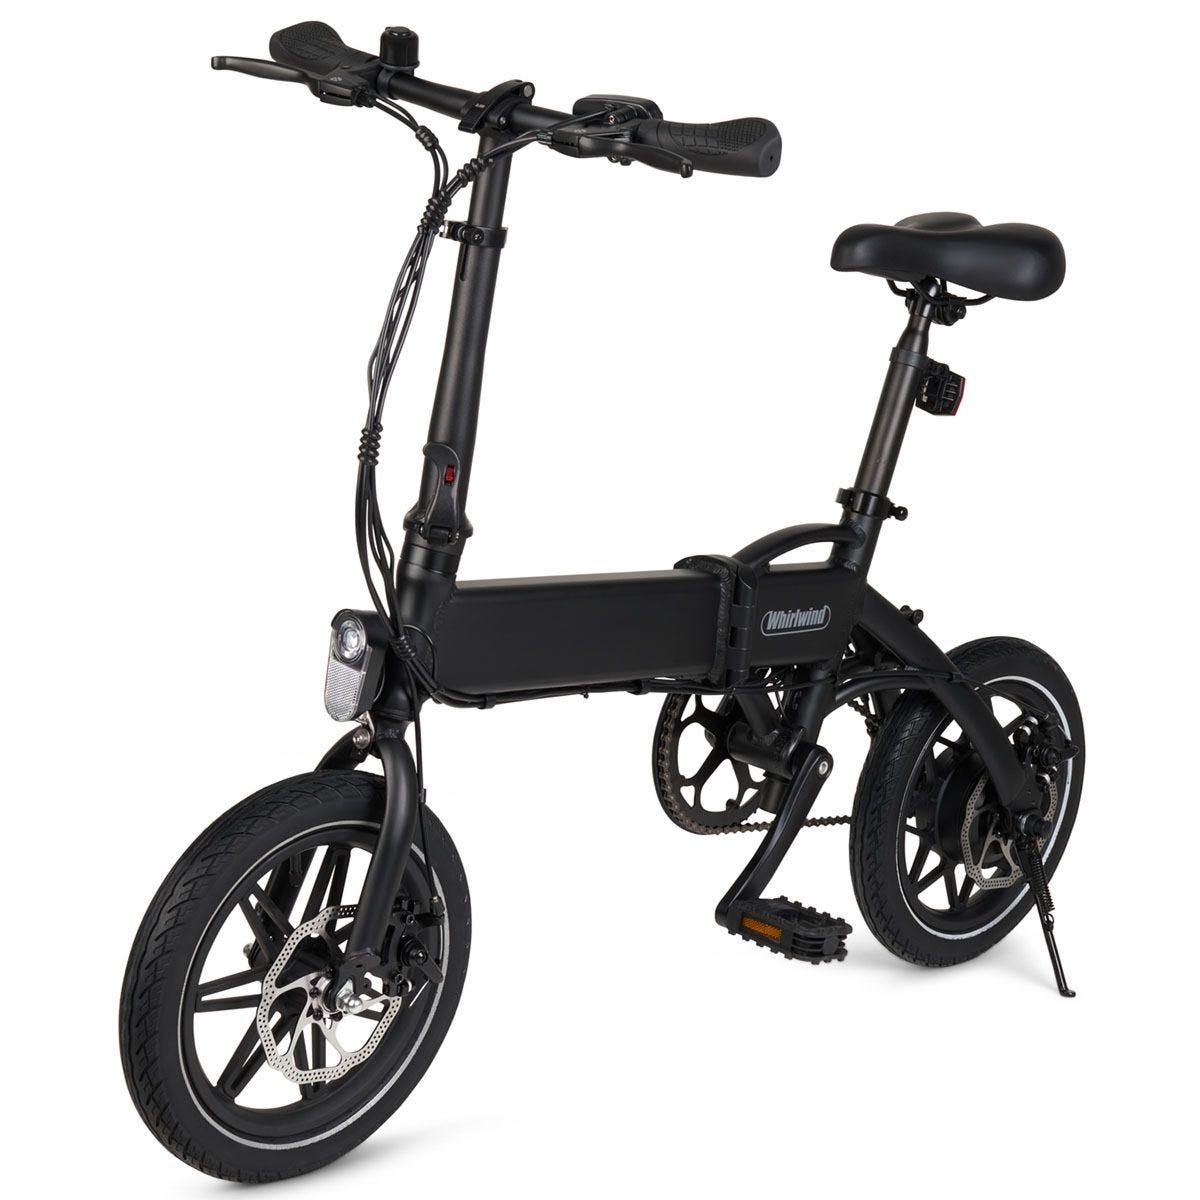 Whirlwind C4 Foldable Electric Bike  - Black